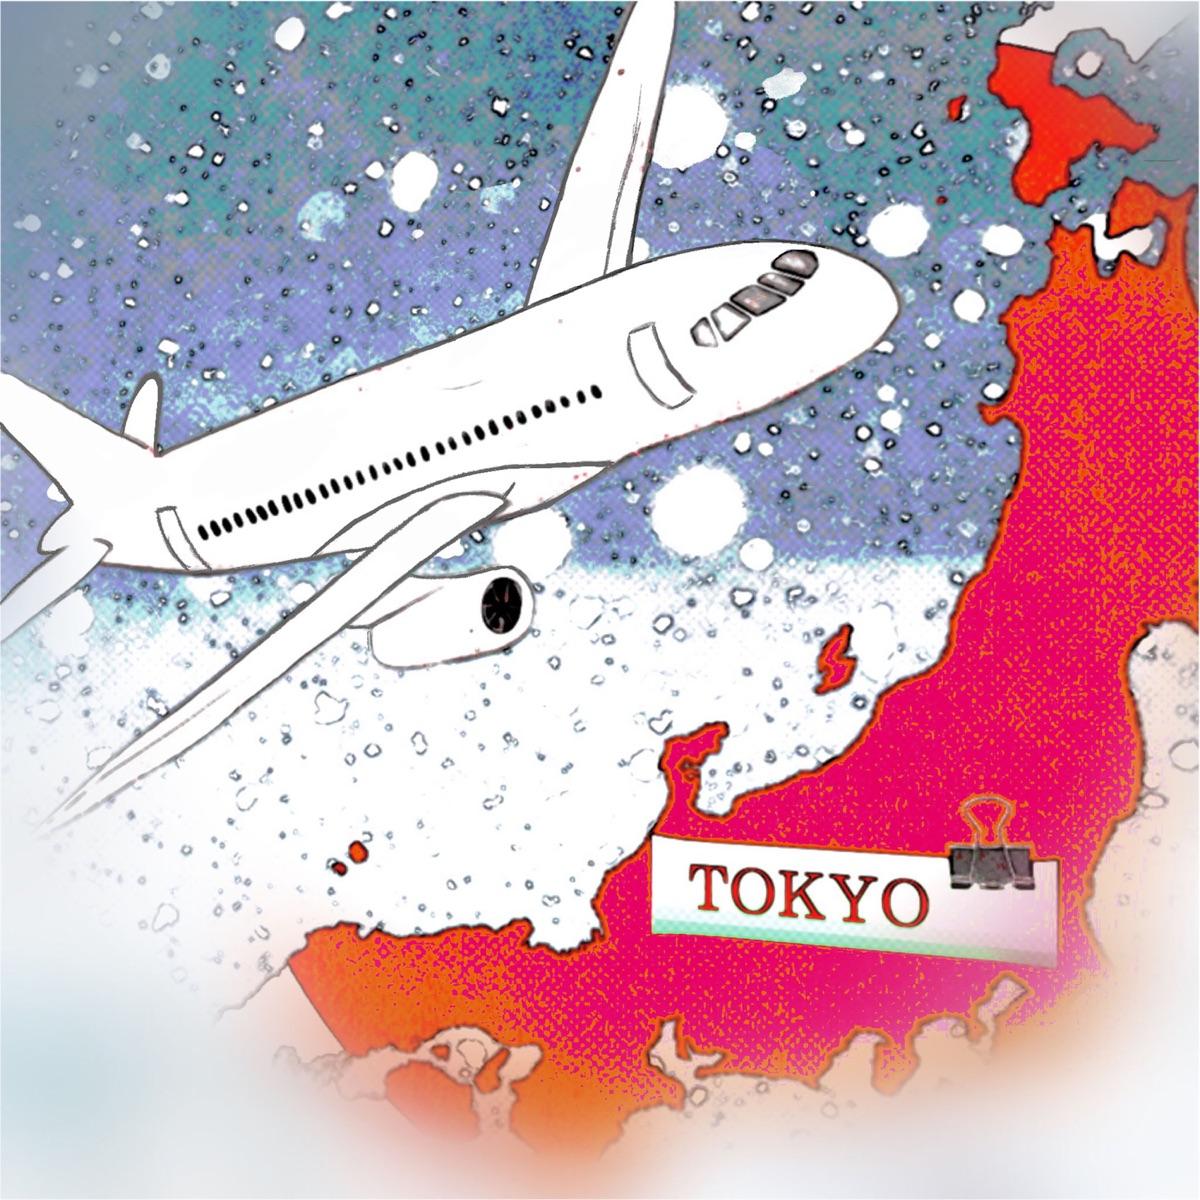 東京 の 冬 歌詞 a 夏目 A夏目 - 東京の冬 歌詞 MV